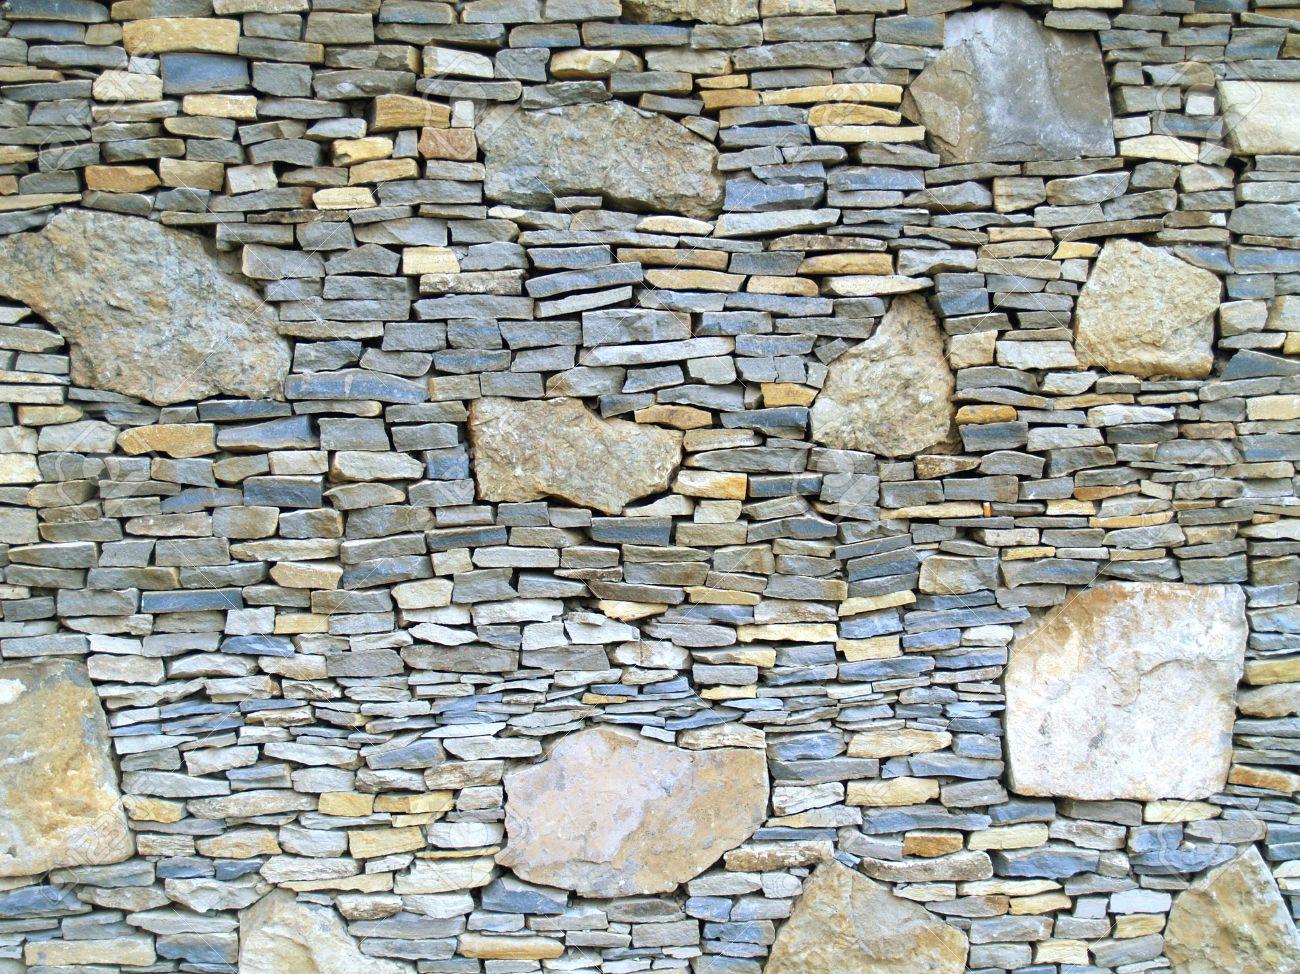 visin horizontal de capas paredes exteriores de piedra arenisca de fomento de fachada a